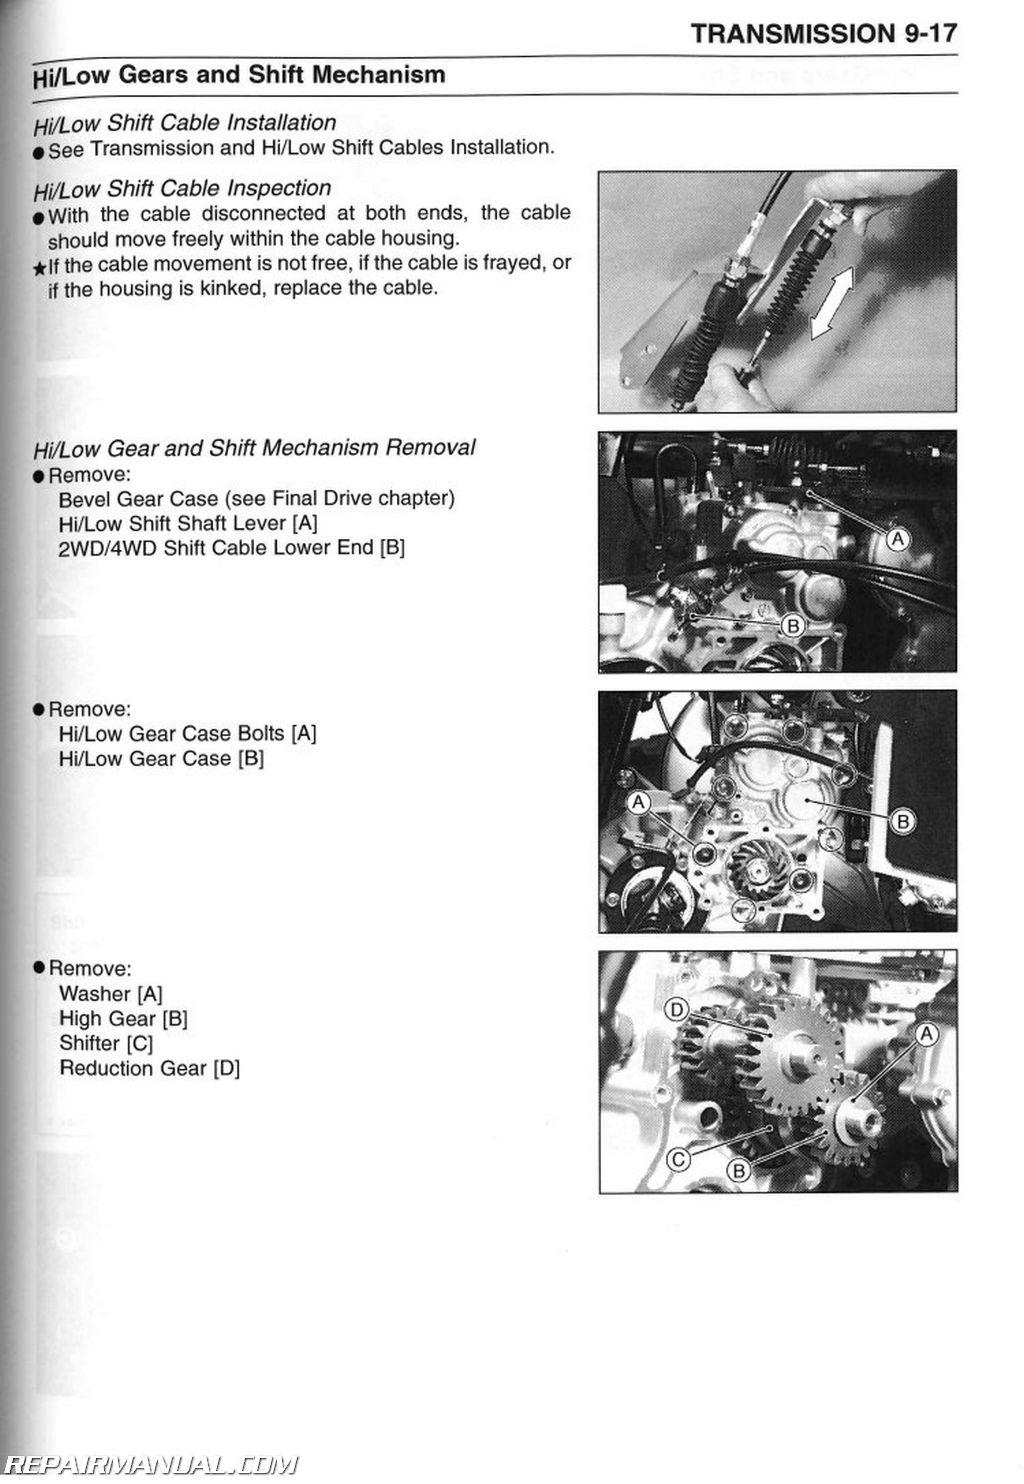 2006 kawasaki mule 3010 wiring diagram 2000 ford f150 power window 2001 2008 kaf620 3000 3020 service manual